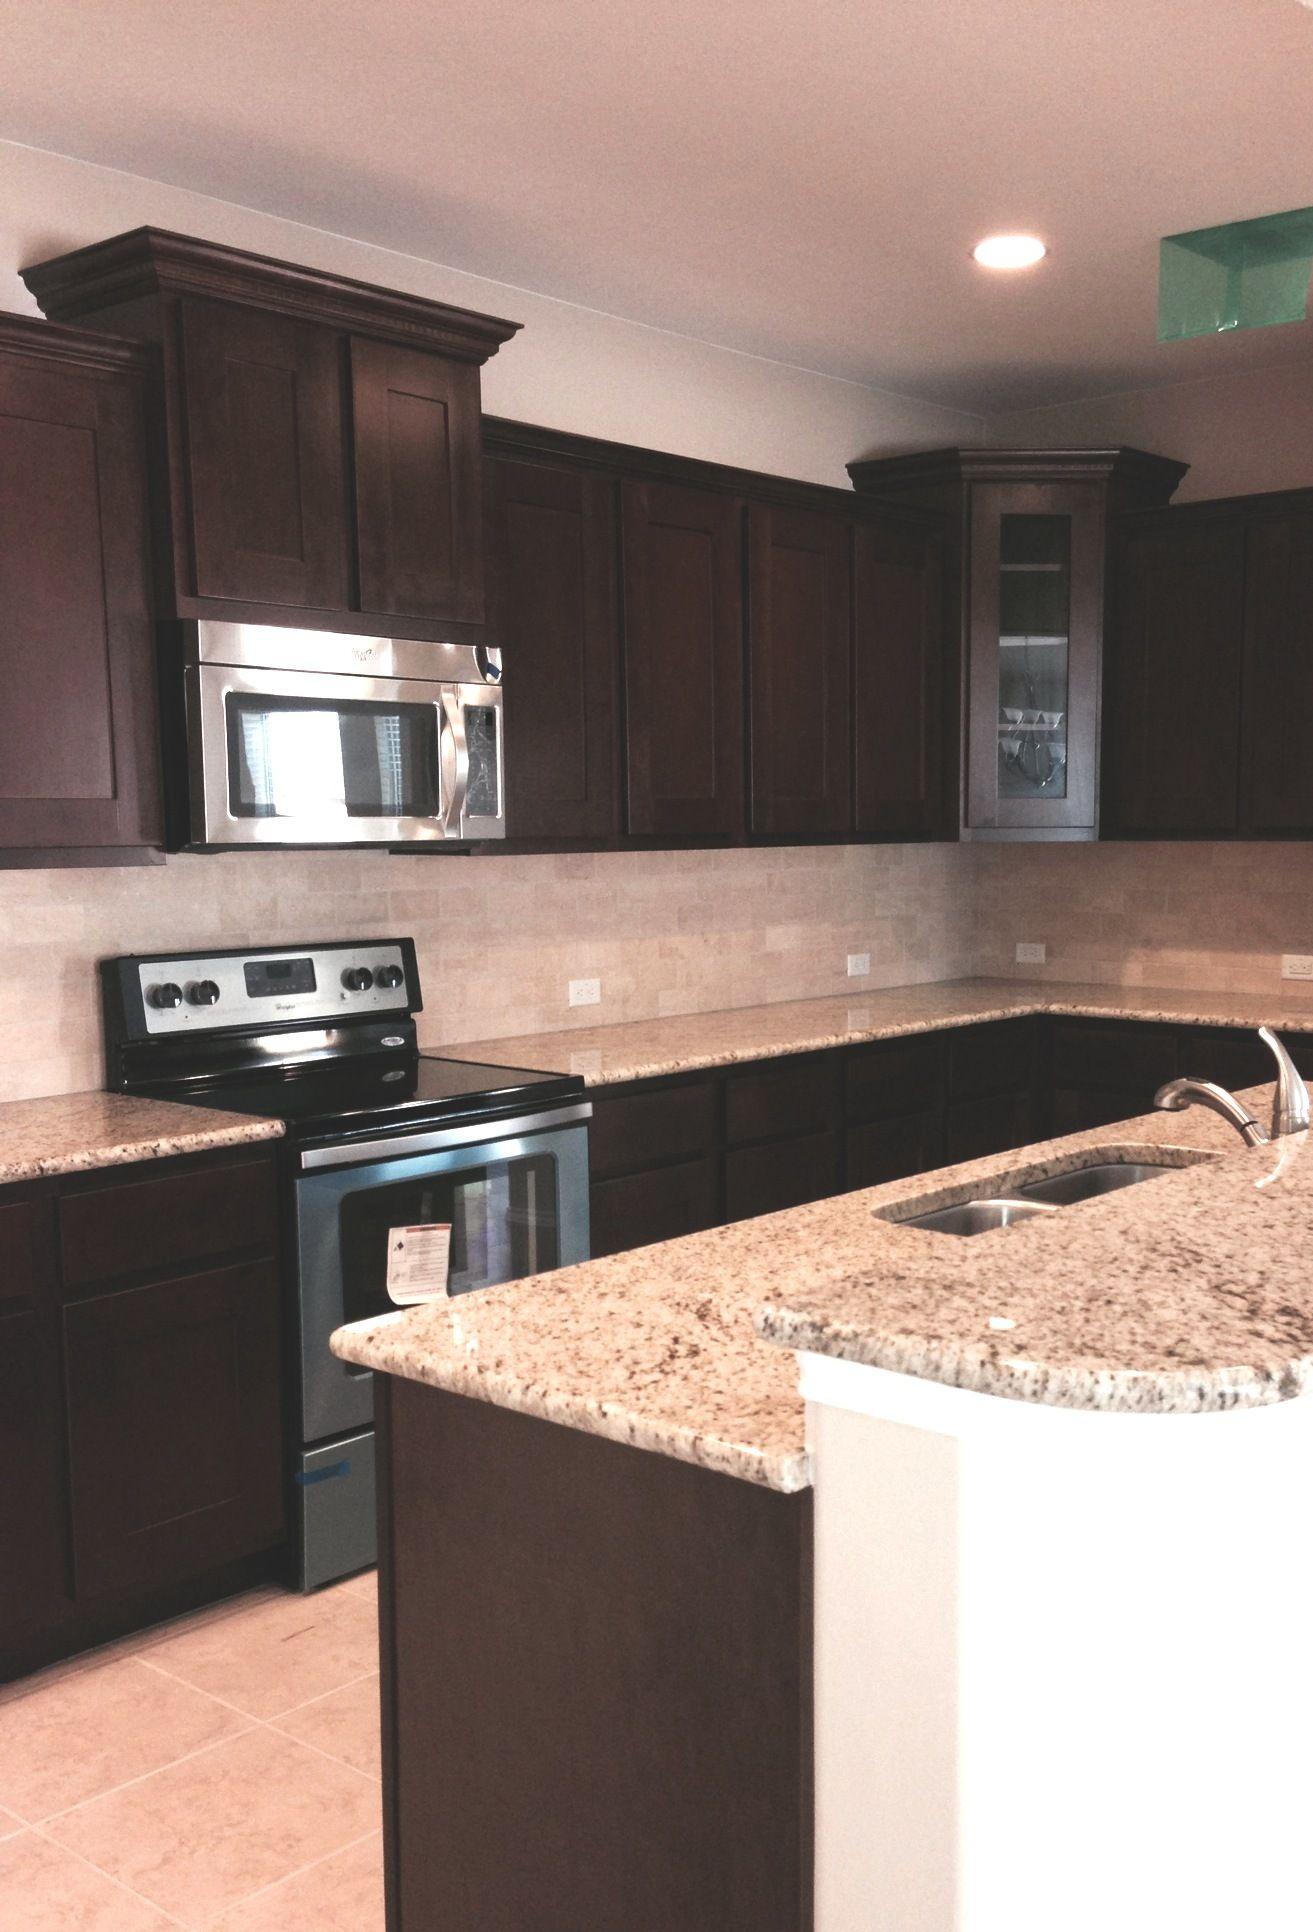 Travertine 3 X 6 In A Brick Lay Pattern Kitchen Backsplash Kitchen Brick Laying 3 x 6 kitchen island